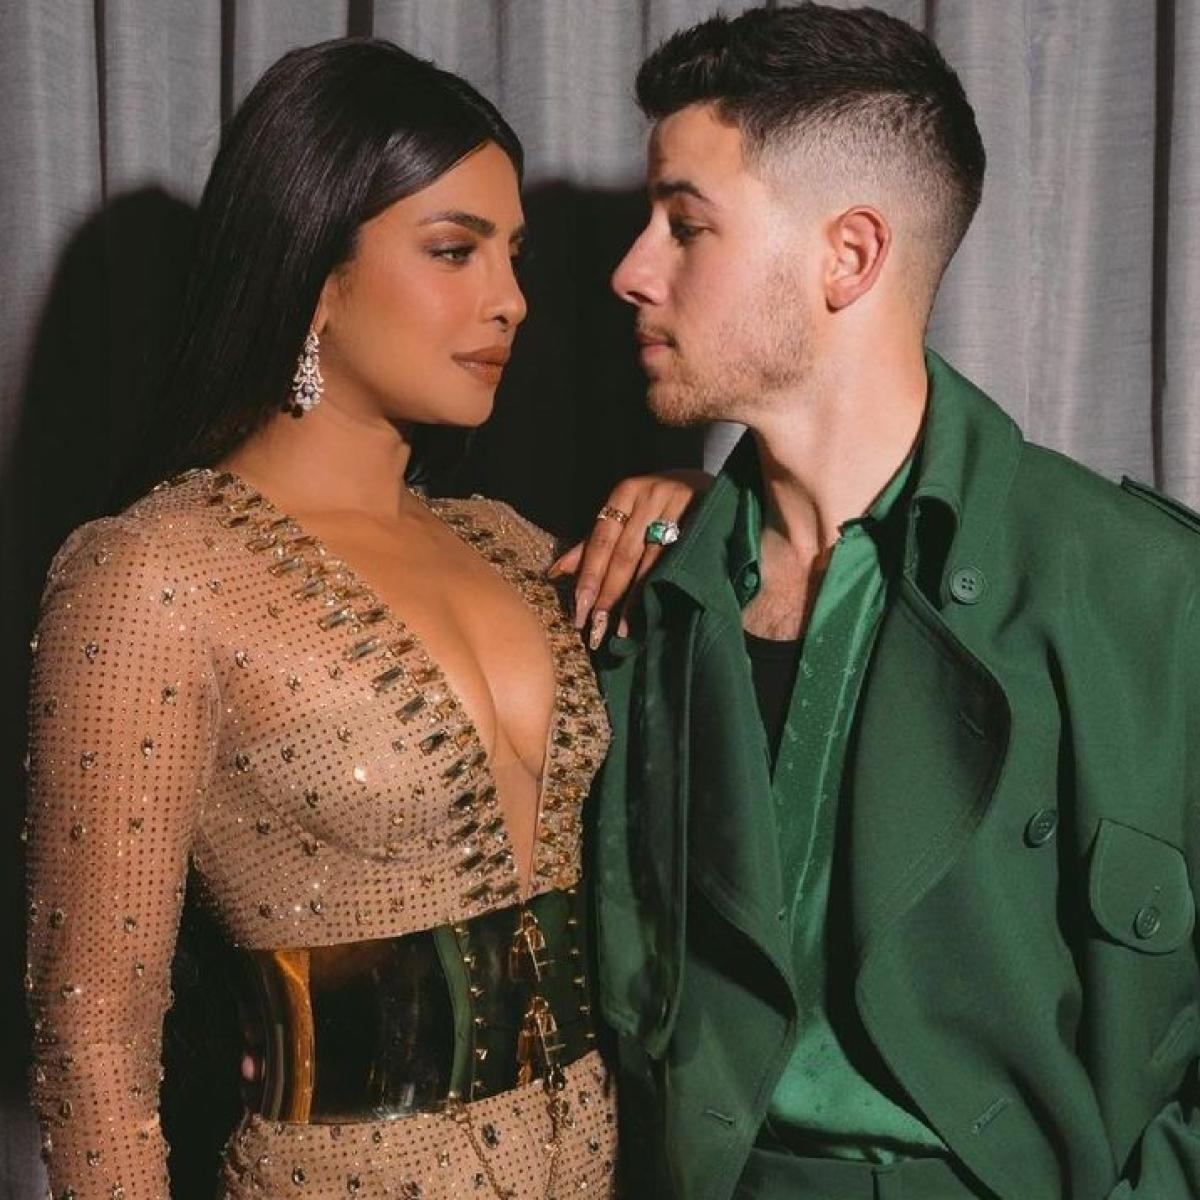 Watch: Nick Jonas fixes wife Priyanka Chopra's gown after locking lips on BBMA red carpet